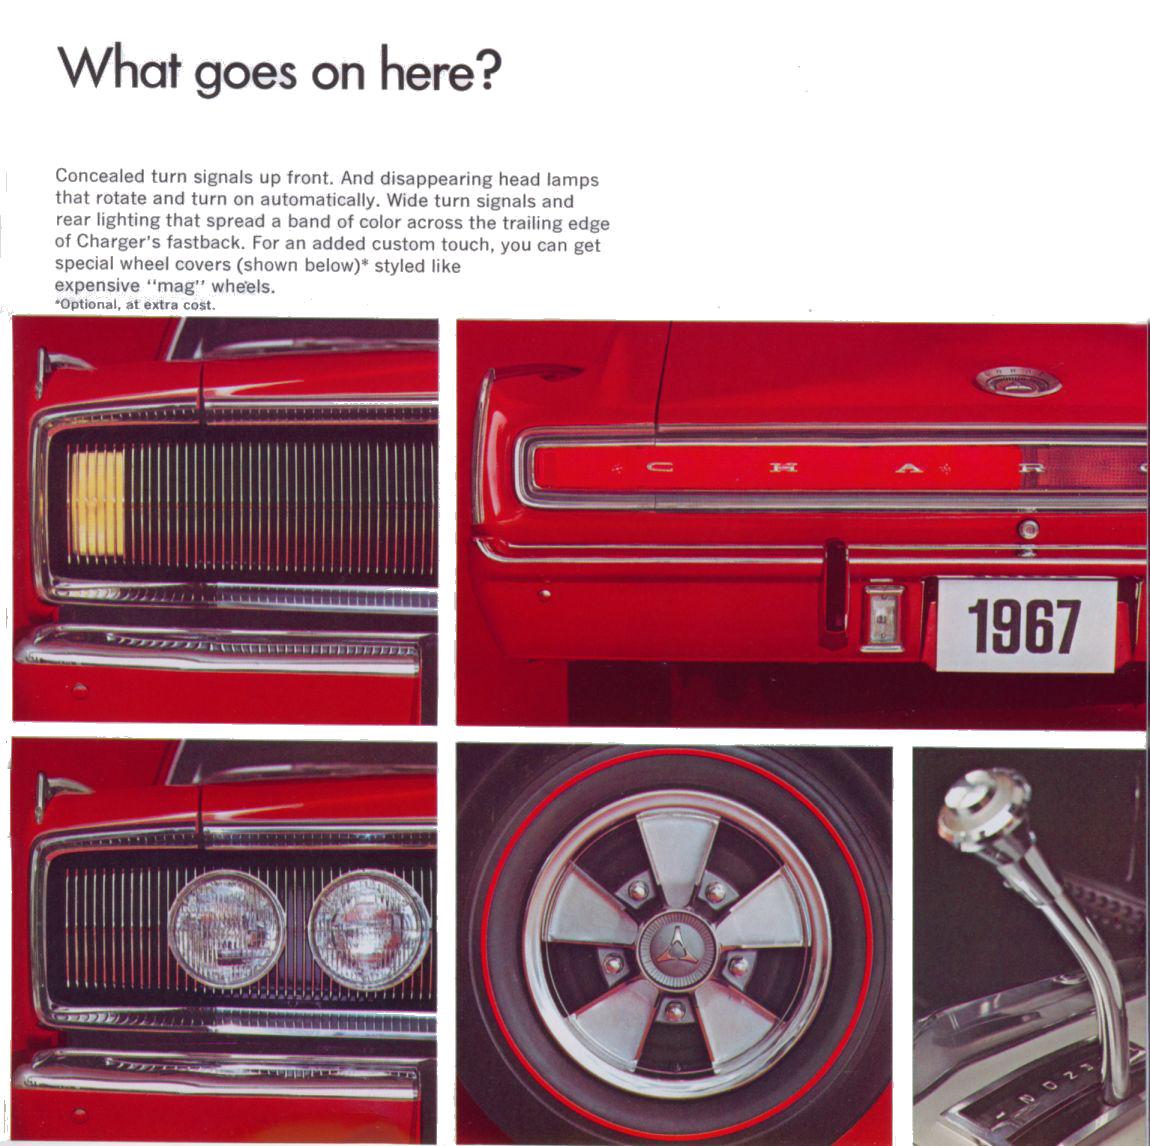 1967 Dodge Charger brochure